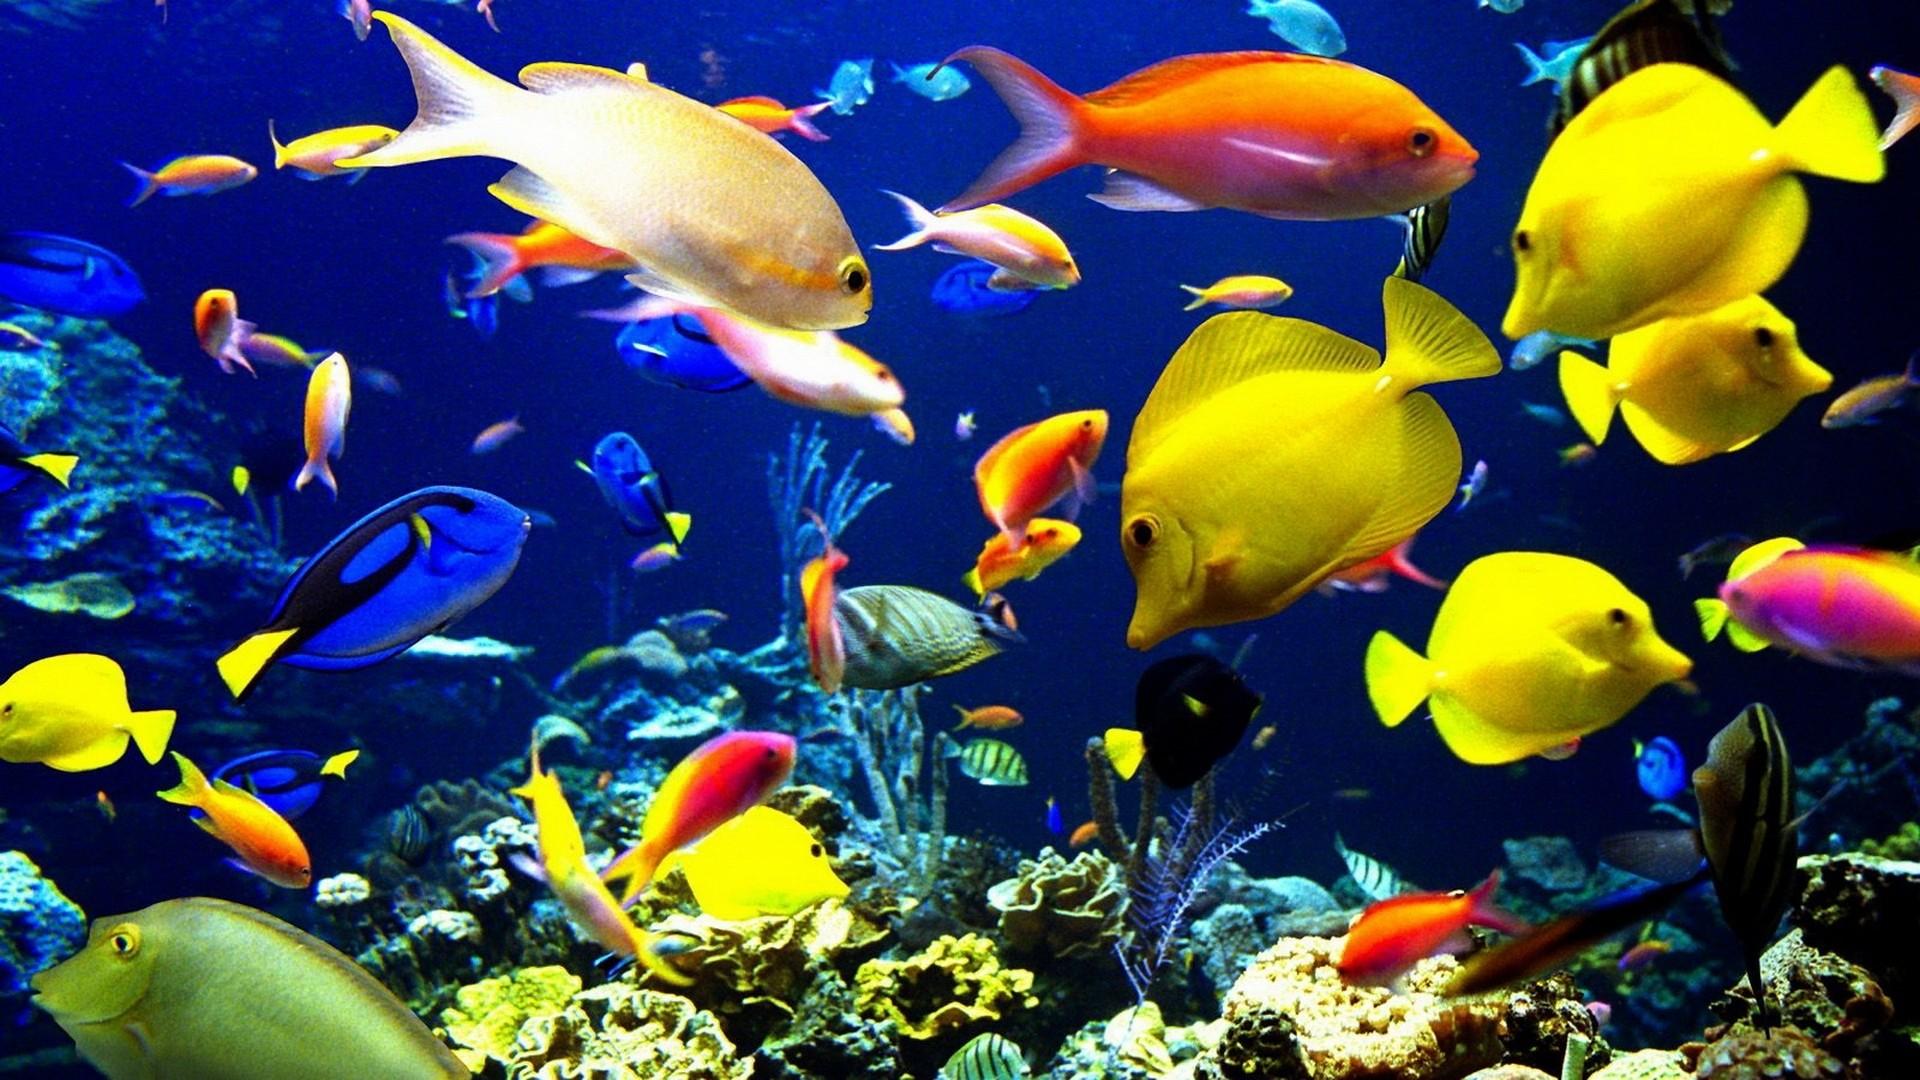 sea ocean coral reef wallpaper | | 27888 | WallpaperUP .